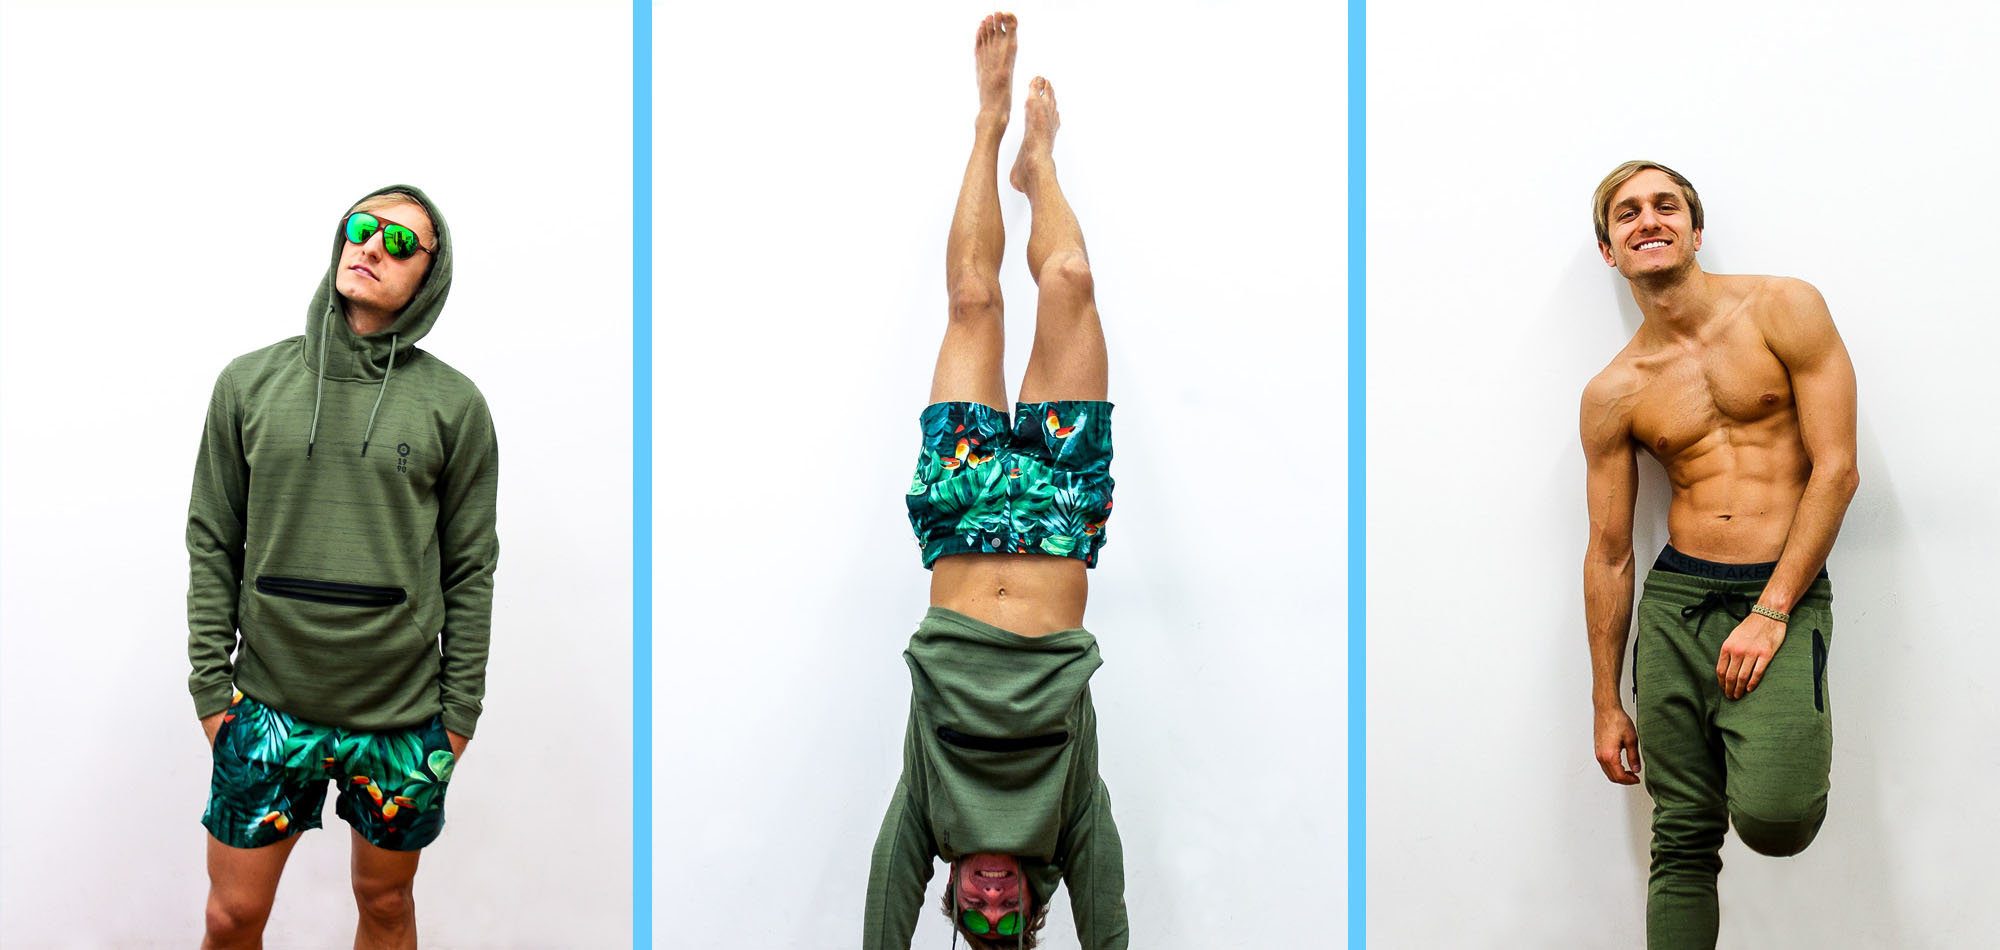 surf_yoga_beer_handstand_triptych.jpg